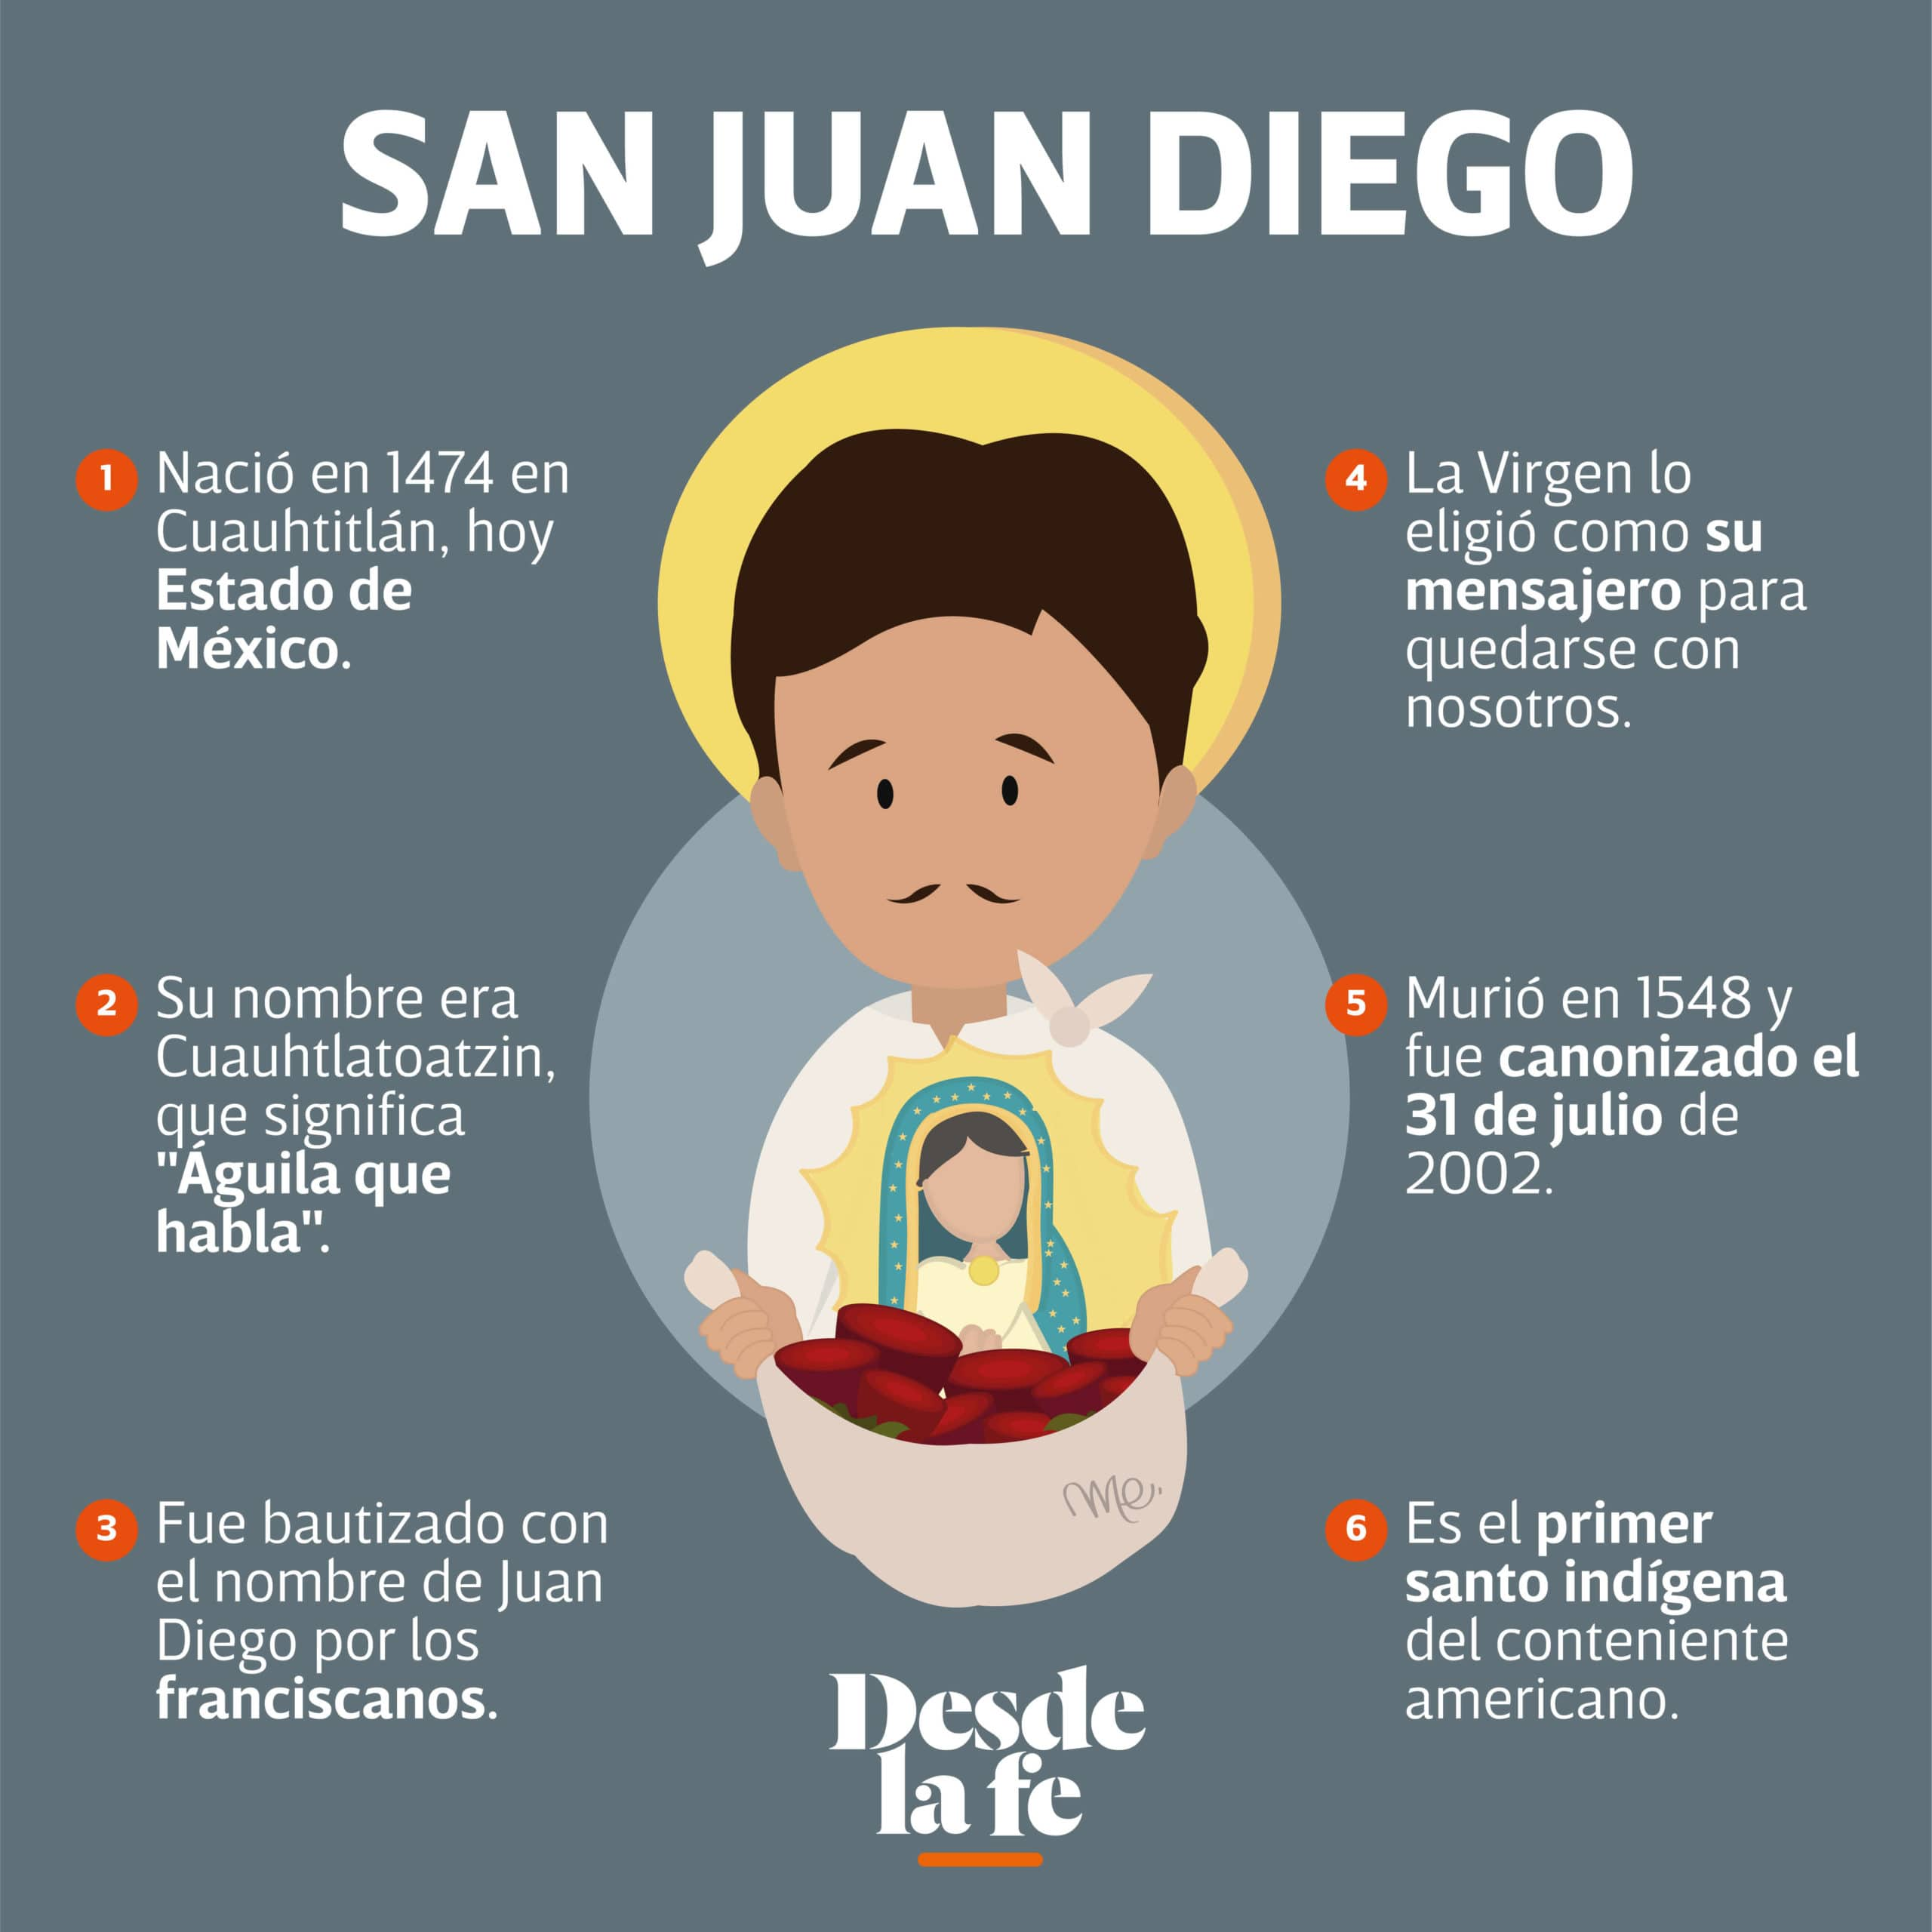 San Juan Diego.